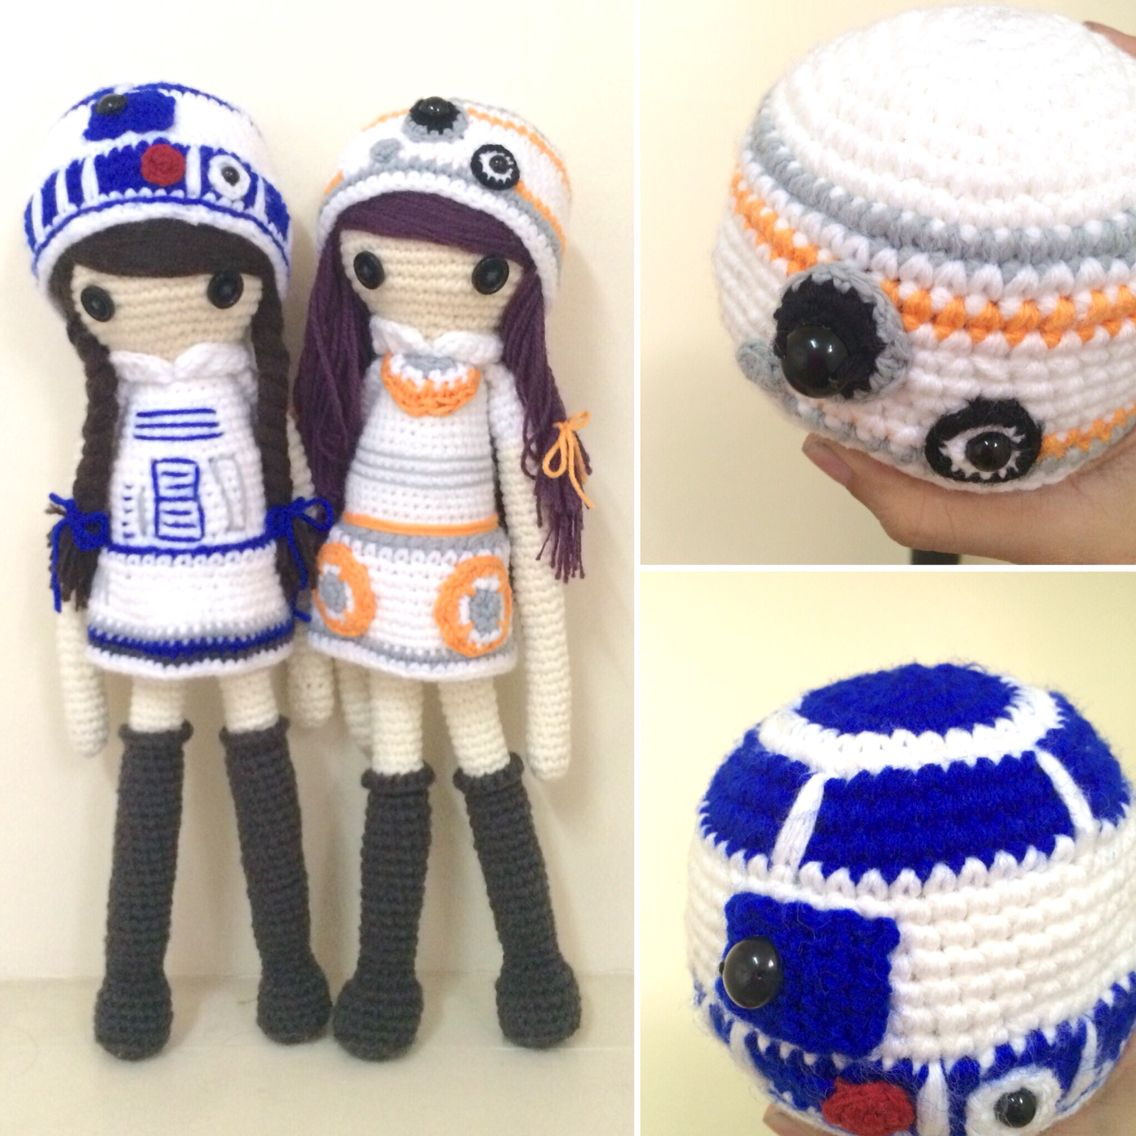 Star Wars R2D2 crocheted art dolls | Crochet | Pinterest | Muñecas ...